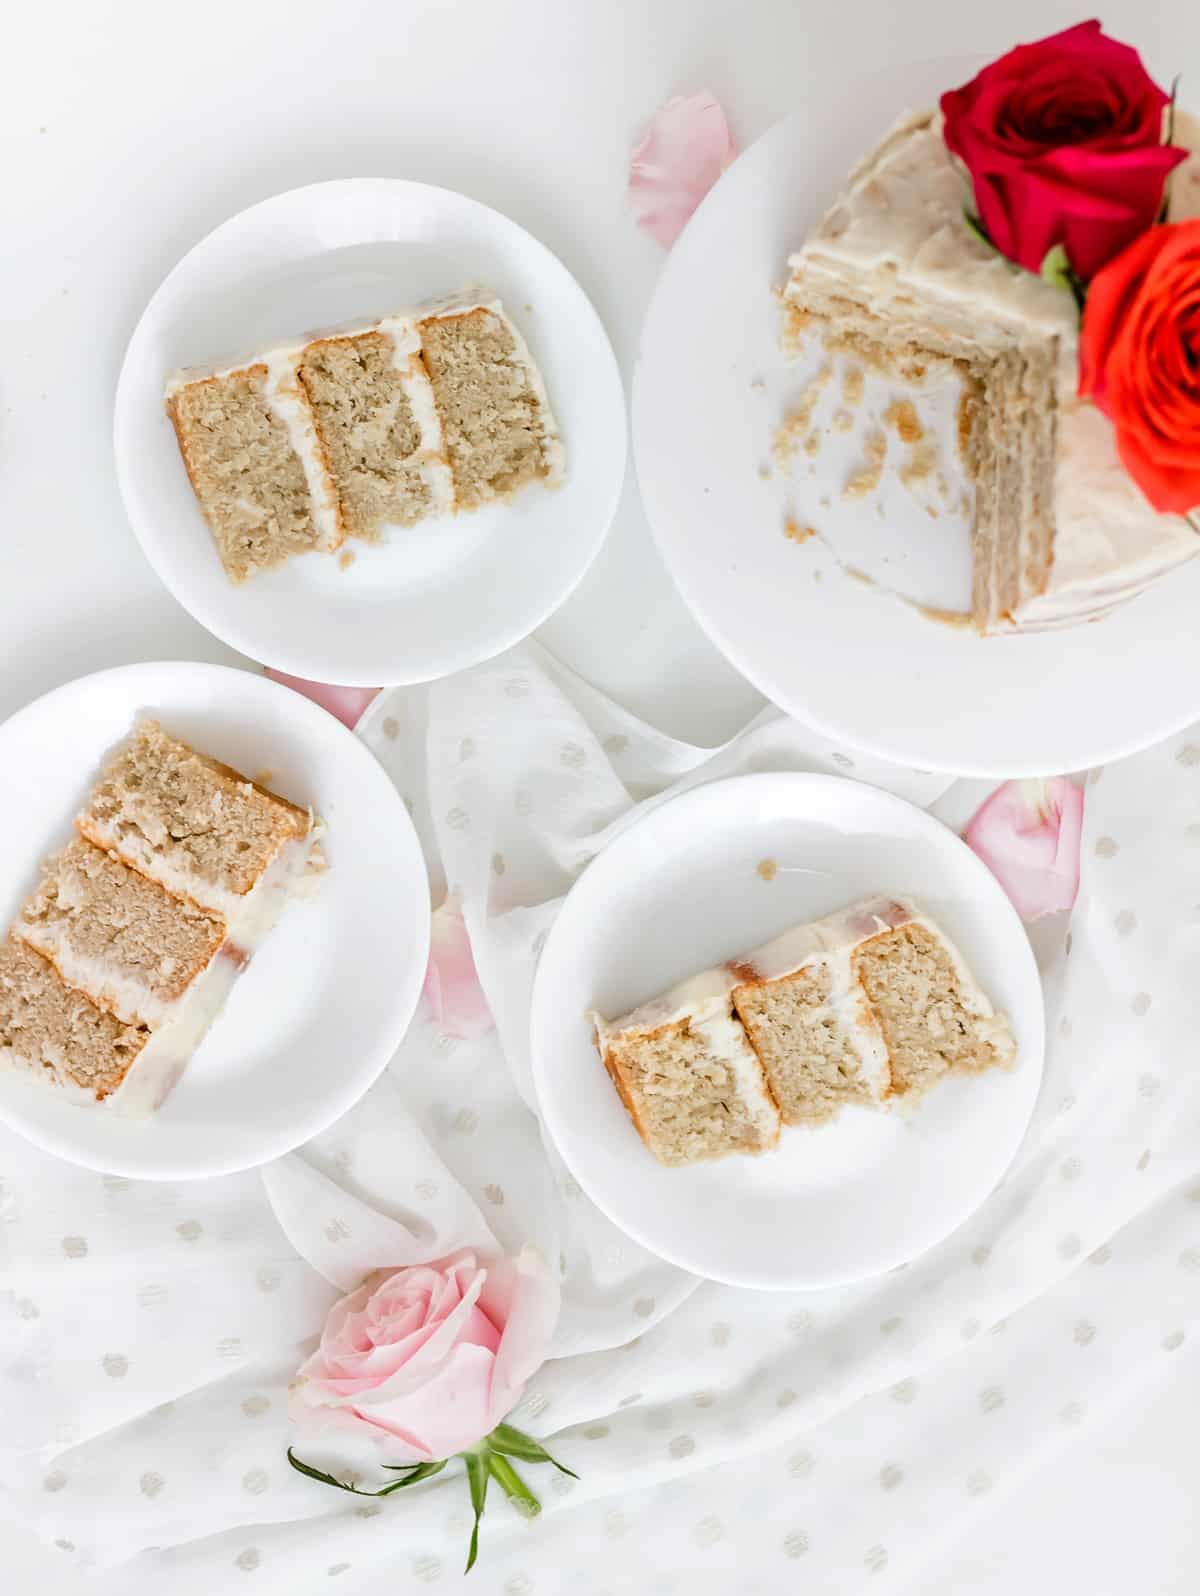 Almond Flour Coconut Sugar Chocolate Cake